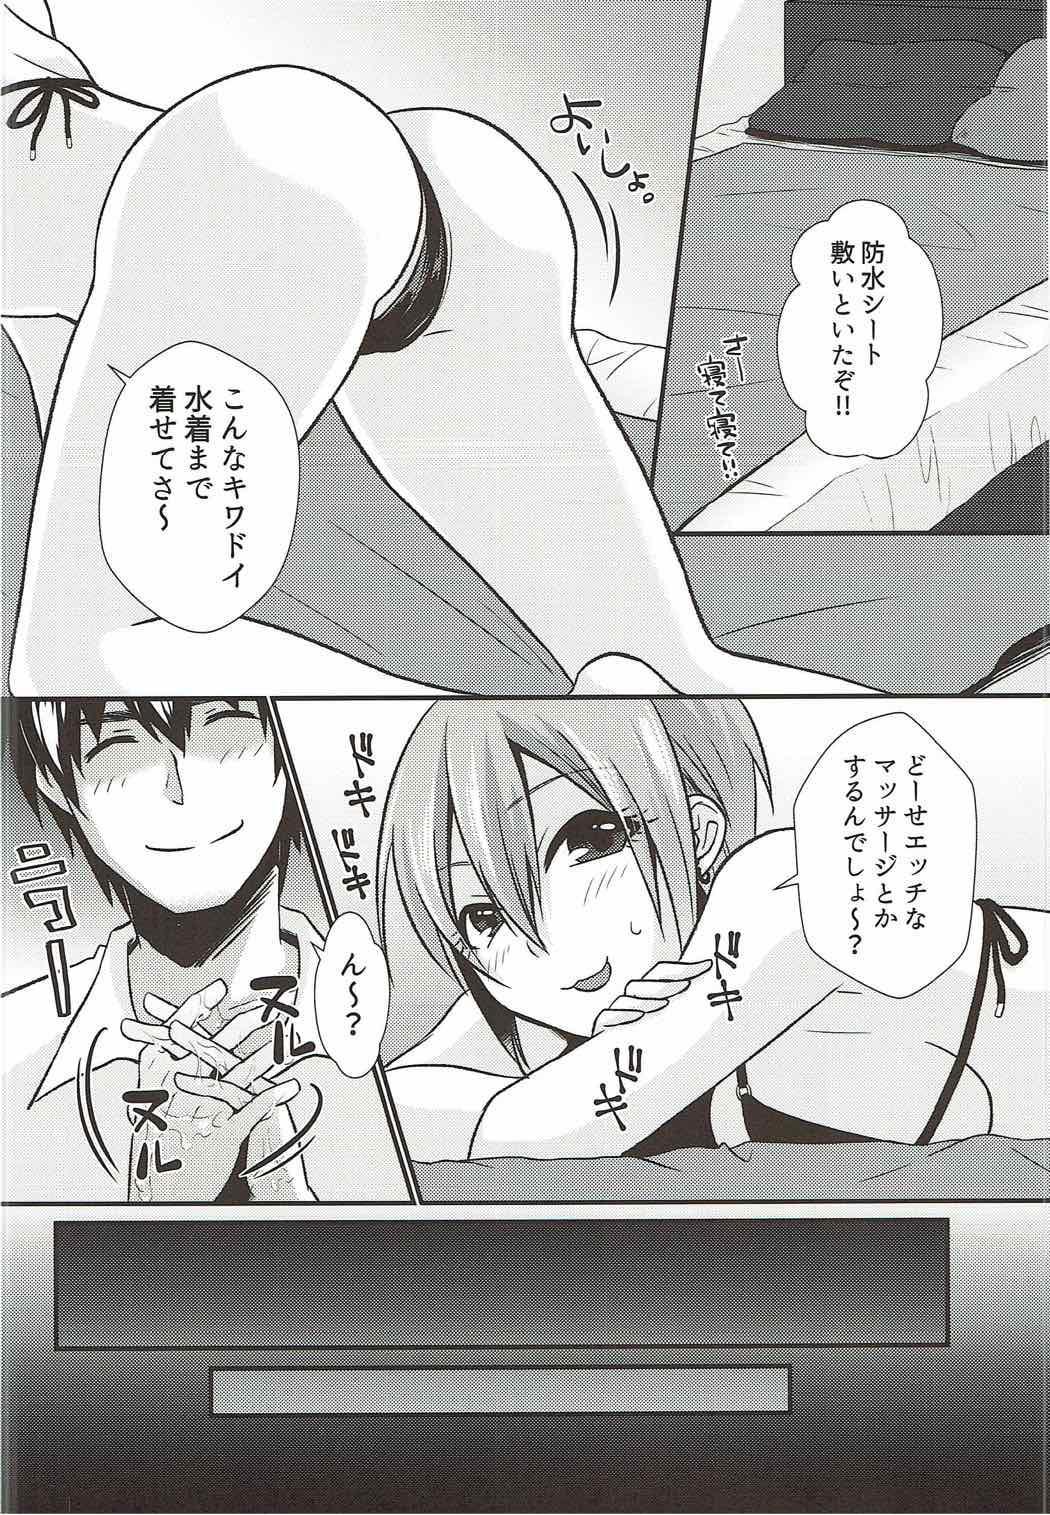 Syuko to Nurunuru Ichaicha Massage 6